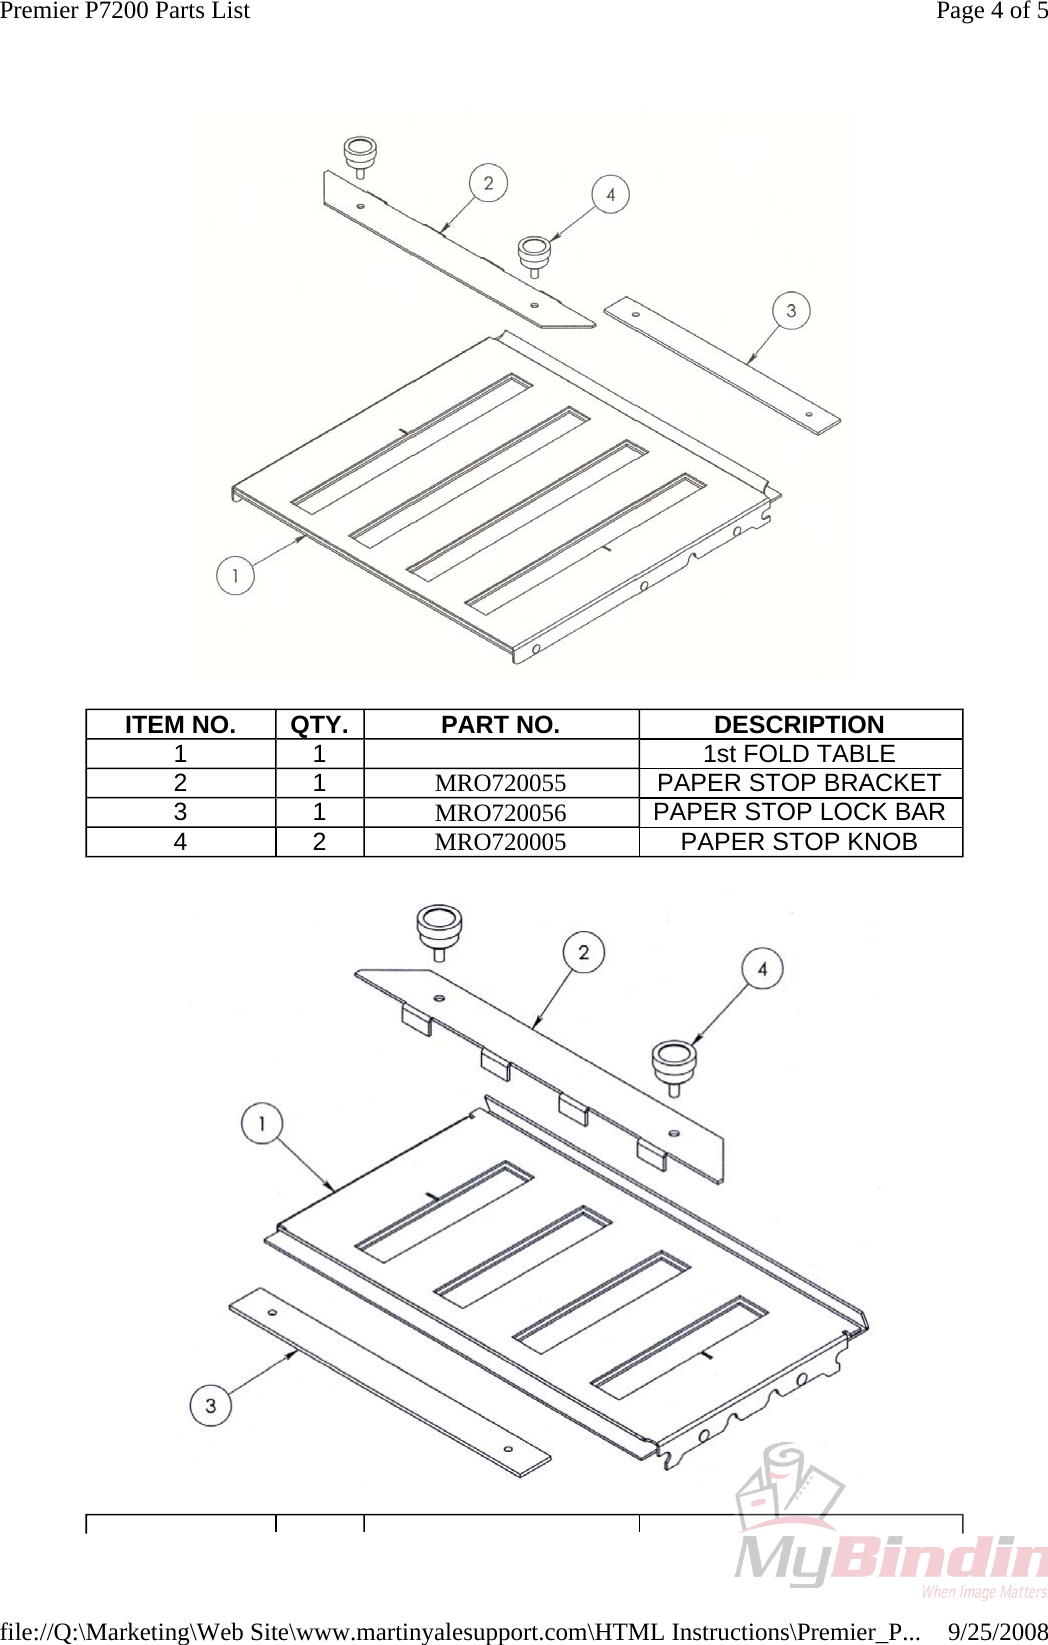 martin yale parts manuals